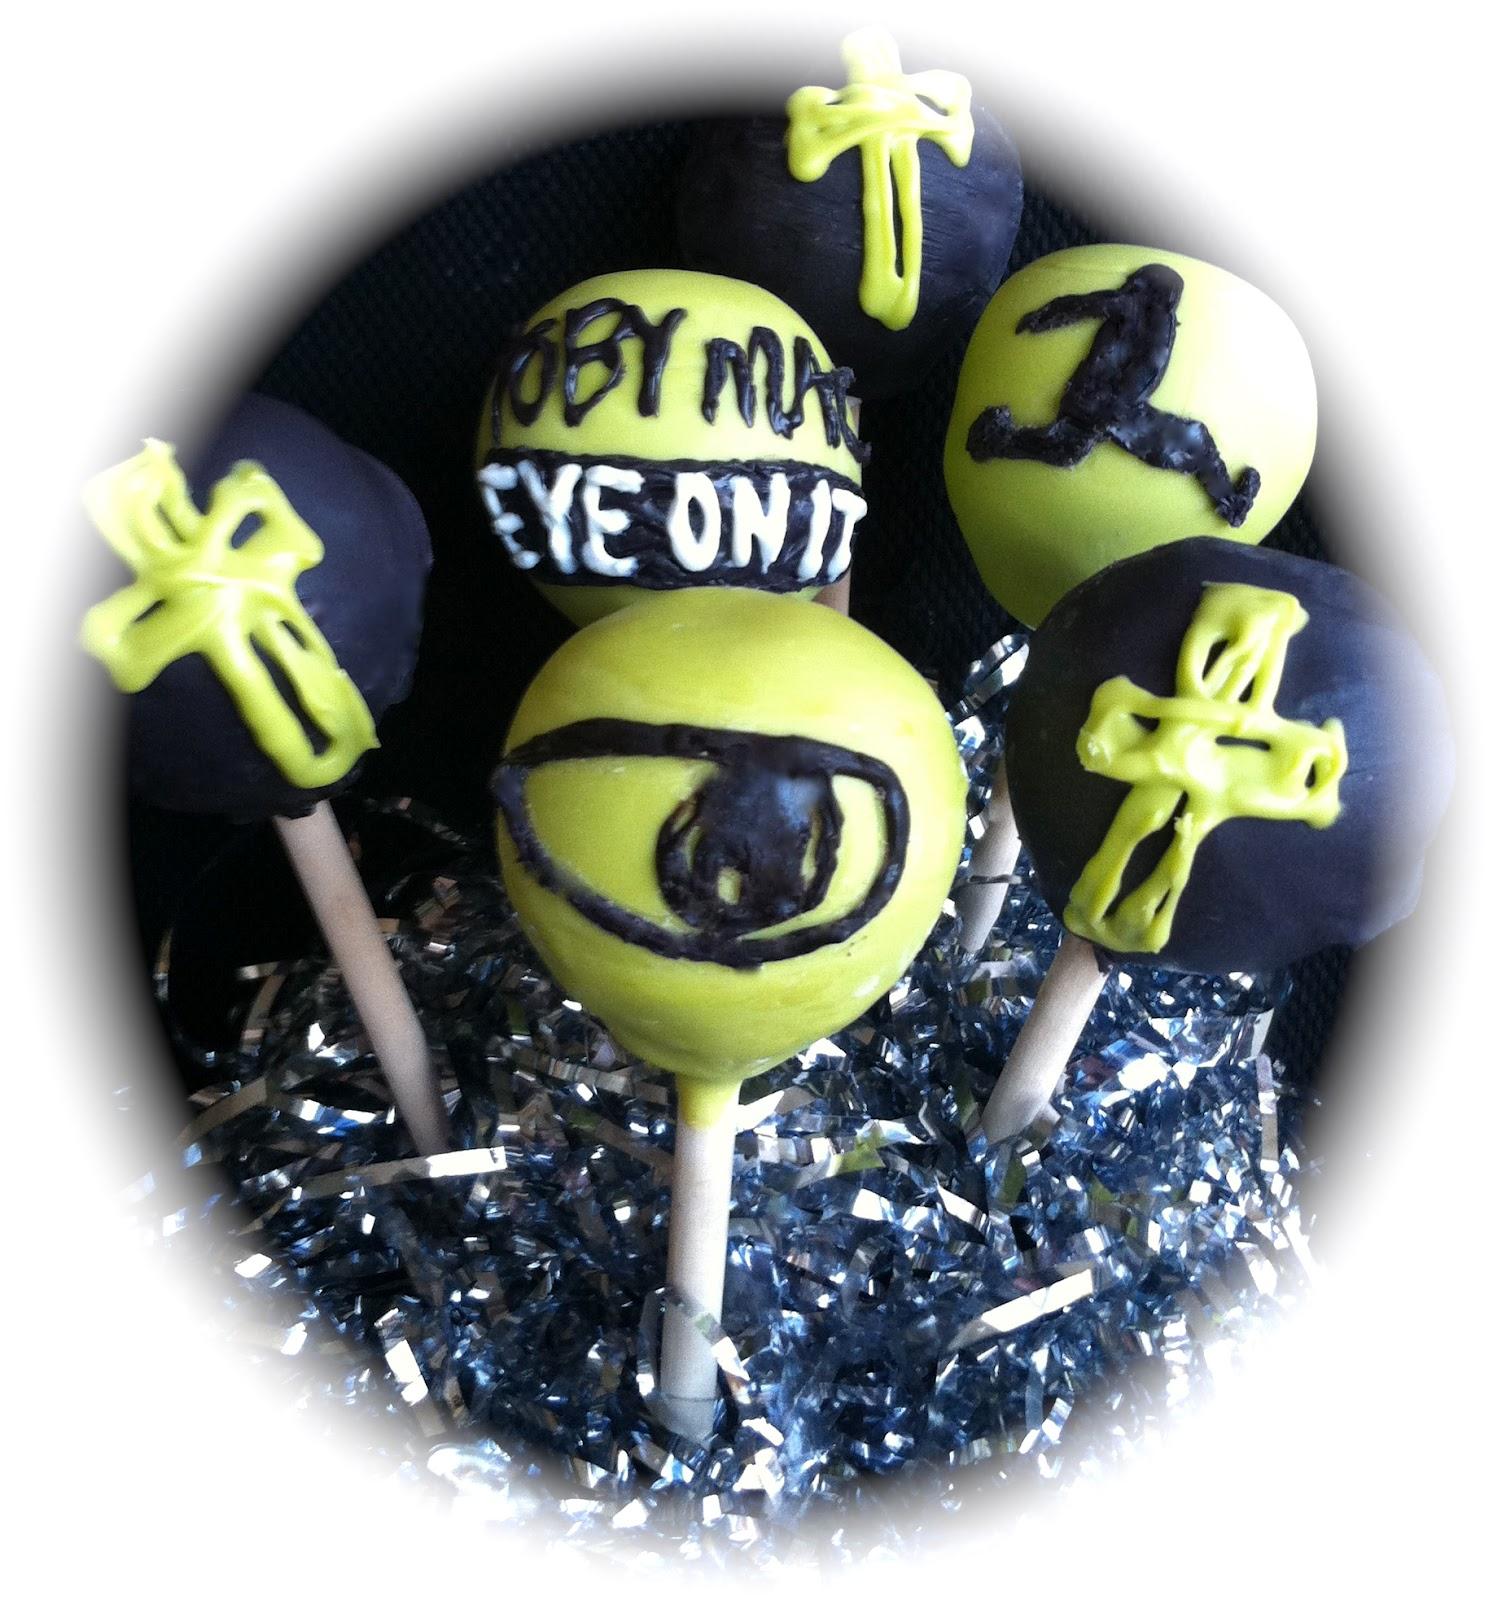 Eye on it tobymac mp3 download myideasbedroom com